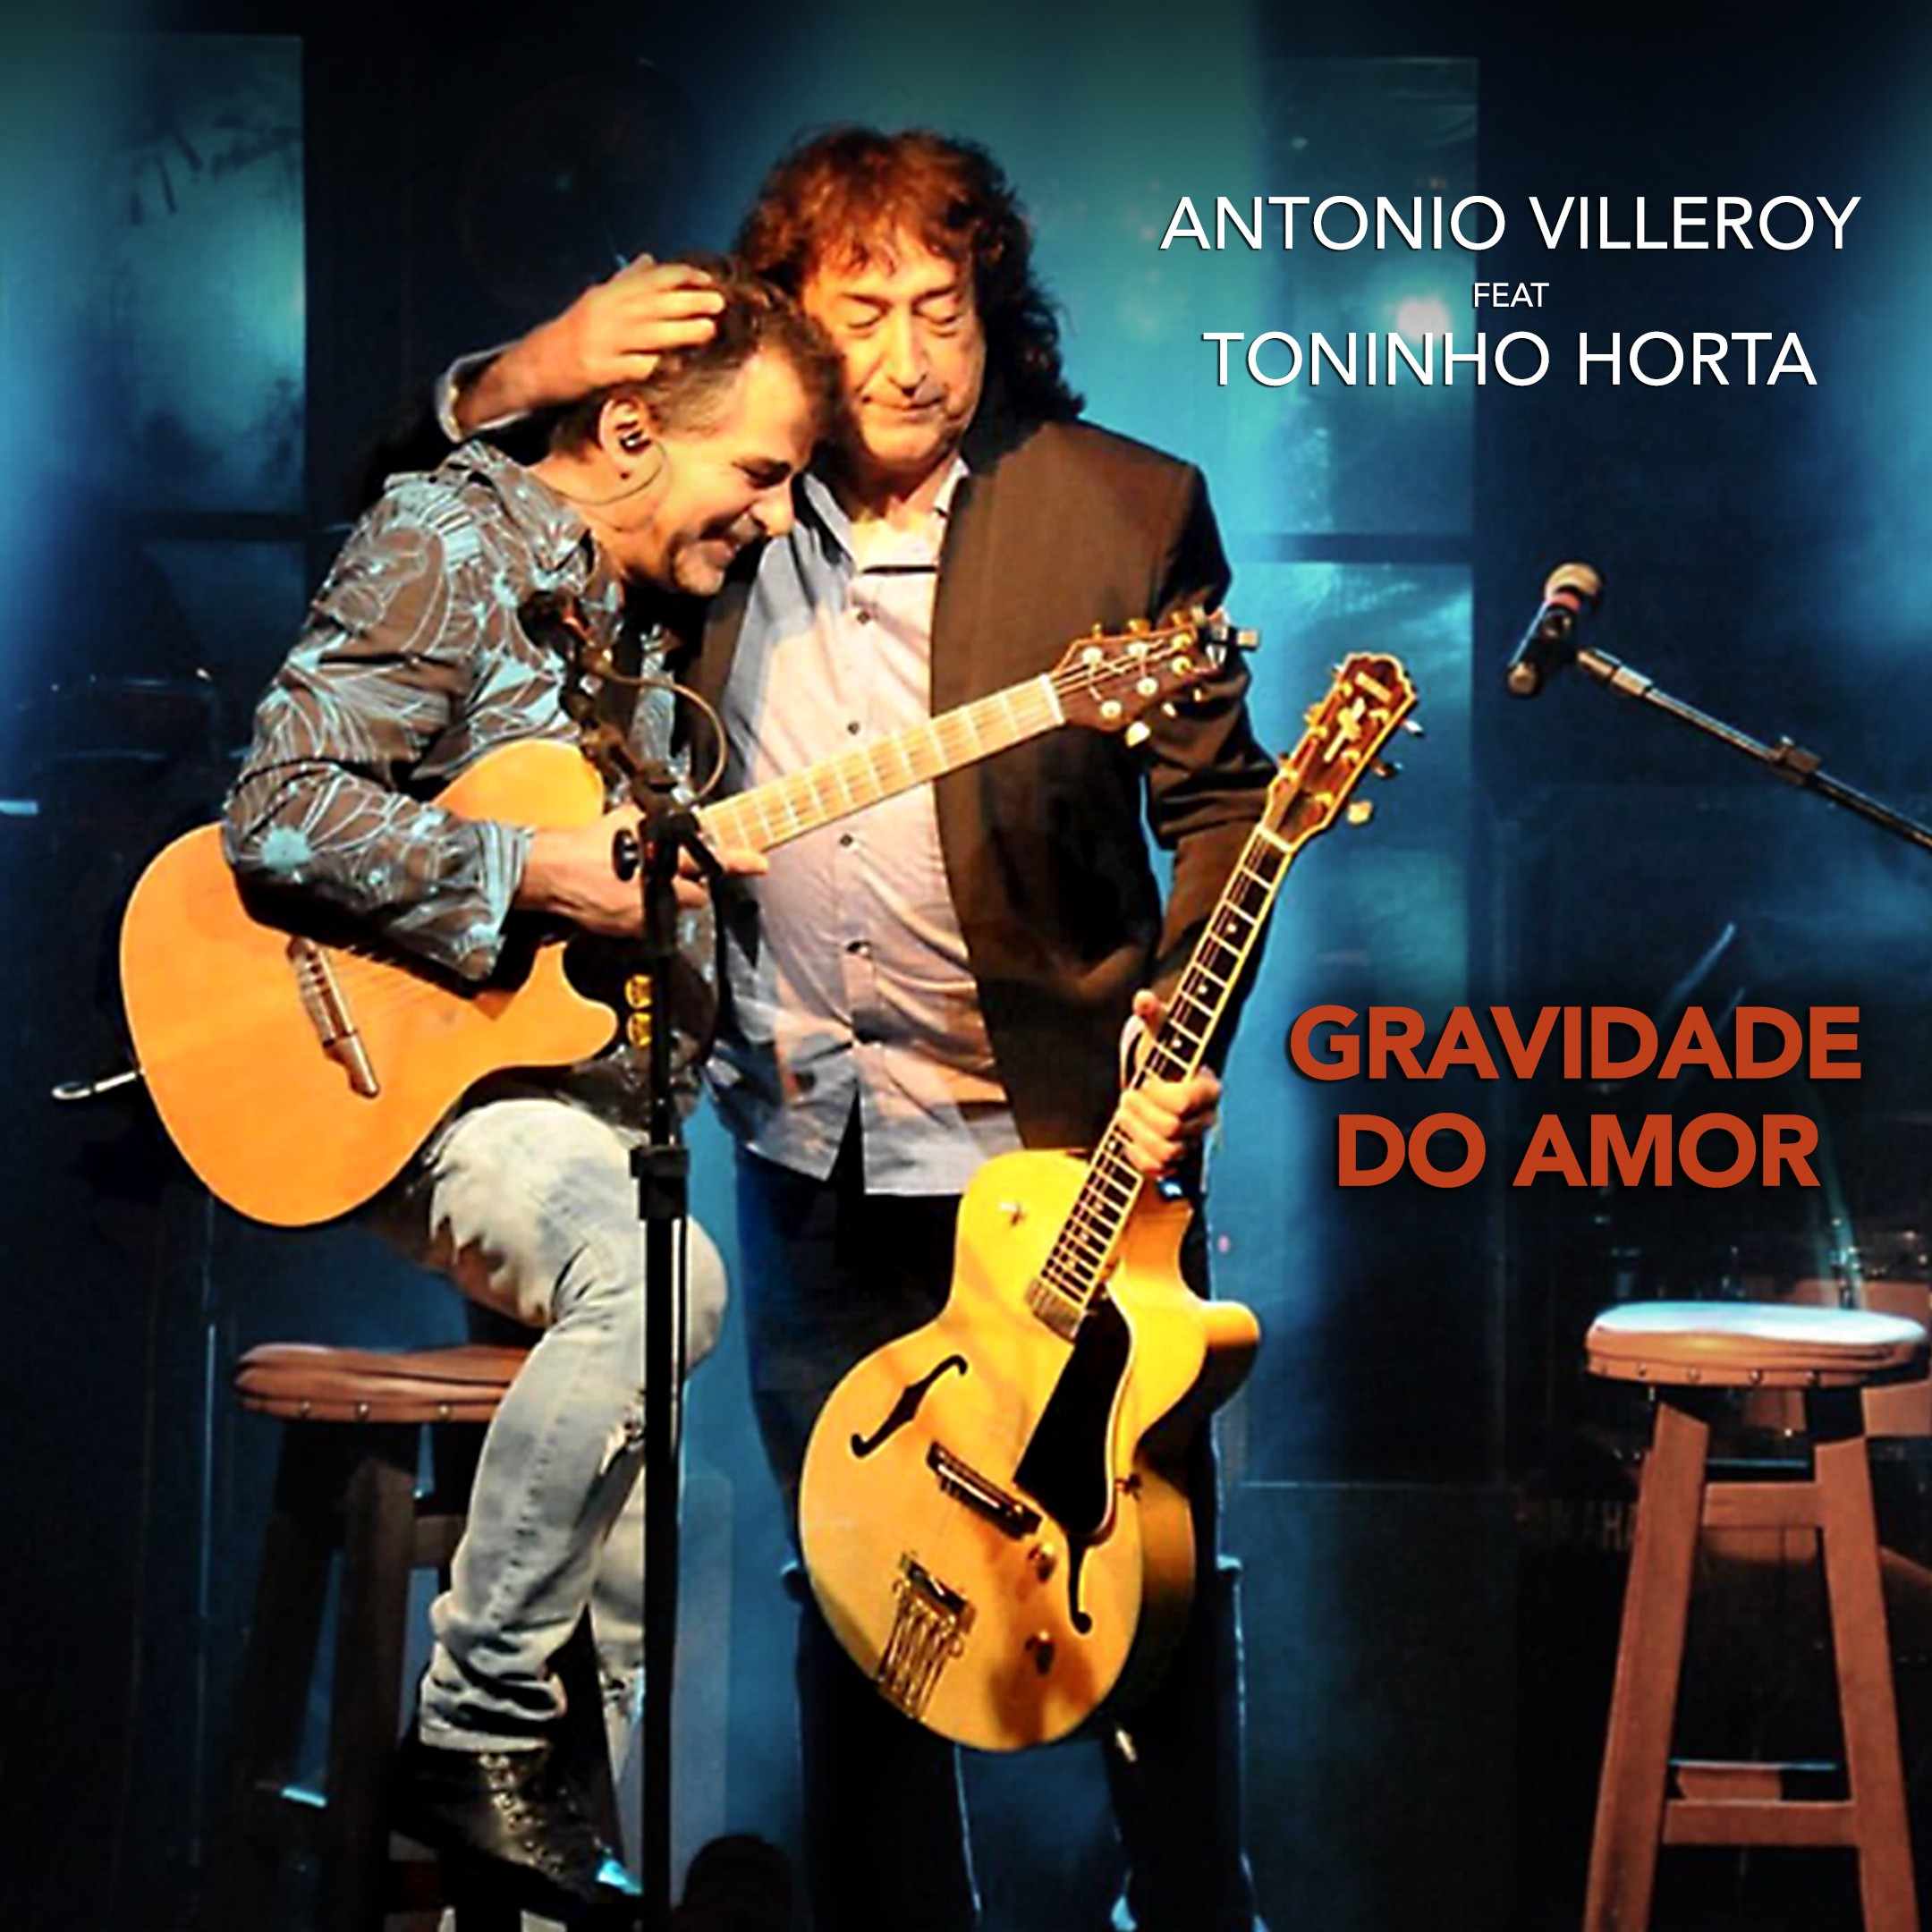 Antonio Villeroy reencontra Toninho Horta no single que aponta o álbum ao vivo 'Gravidade do amor'